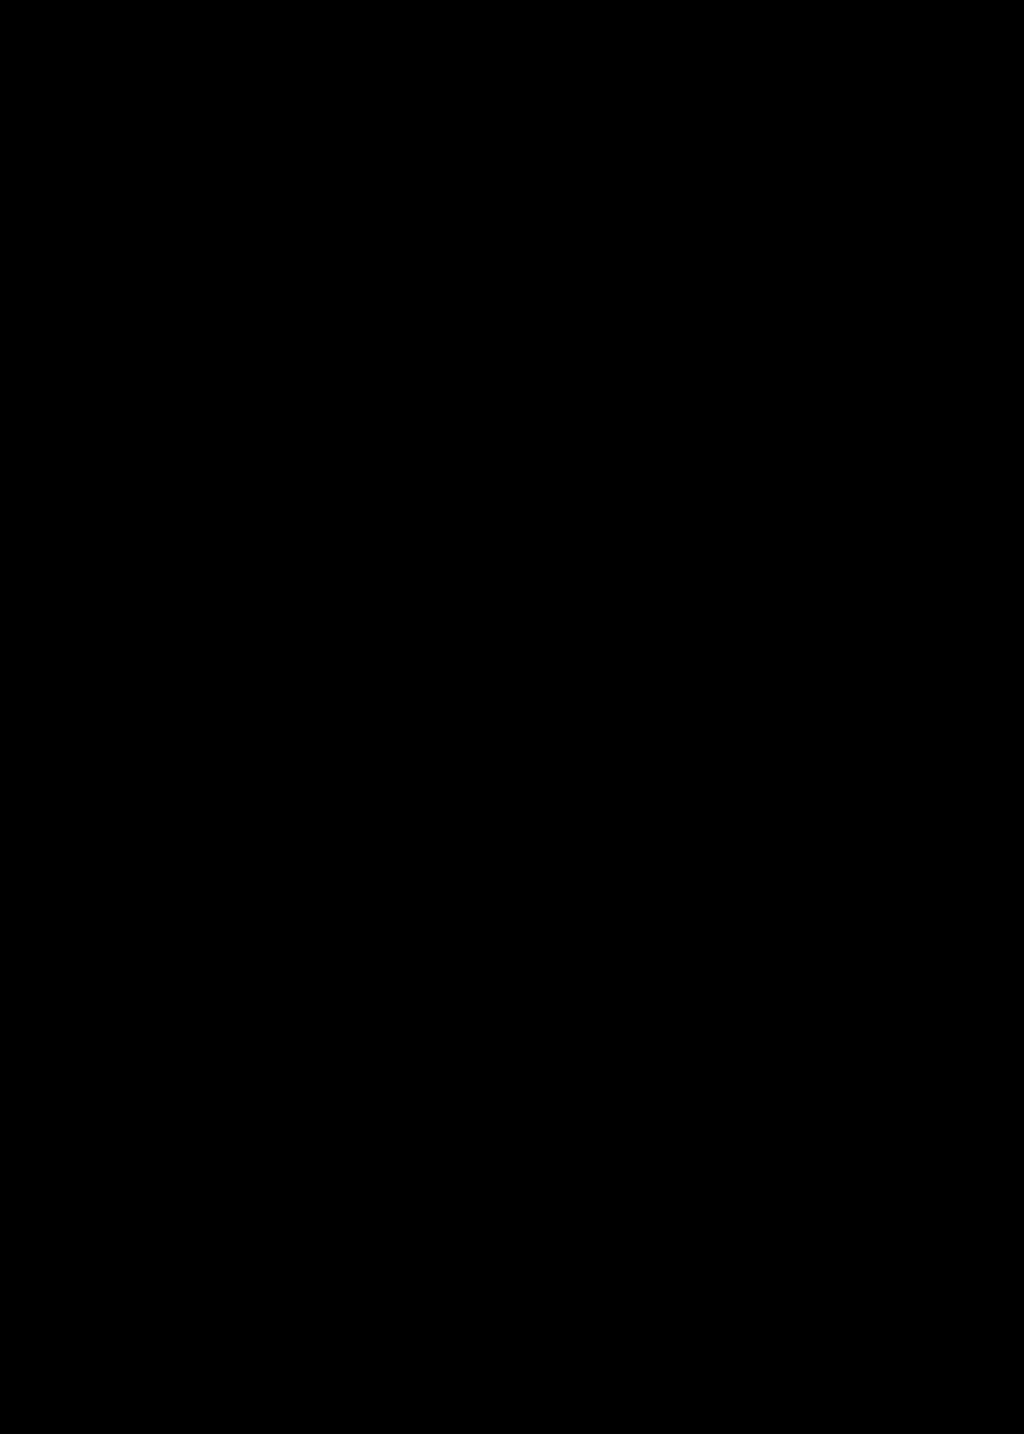 shinon lineartdipolarsquire on deviantart